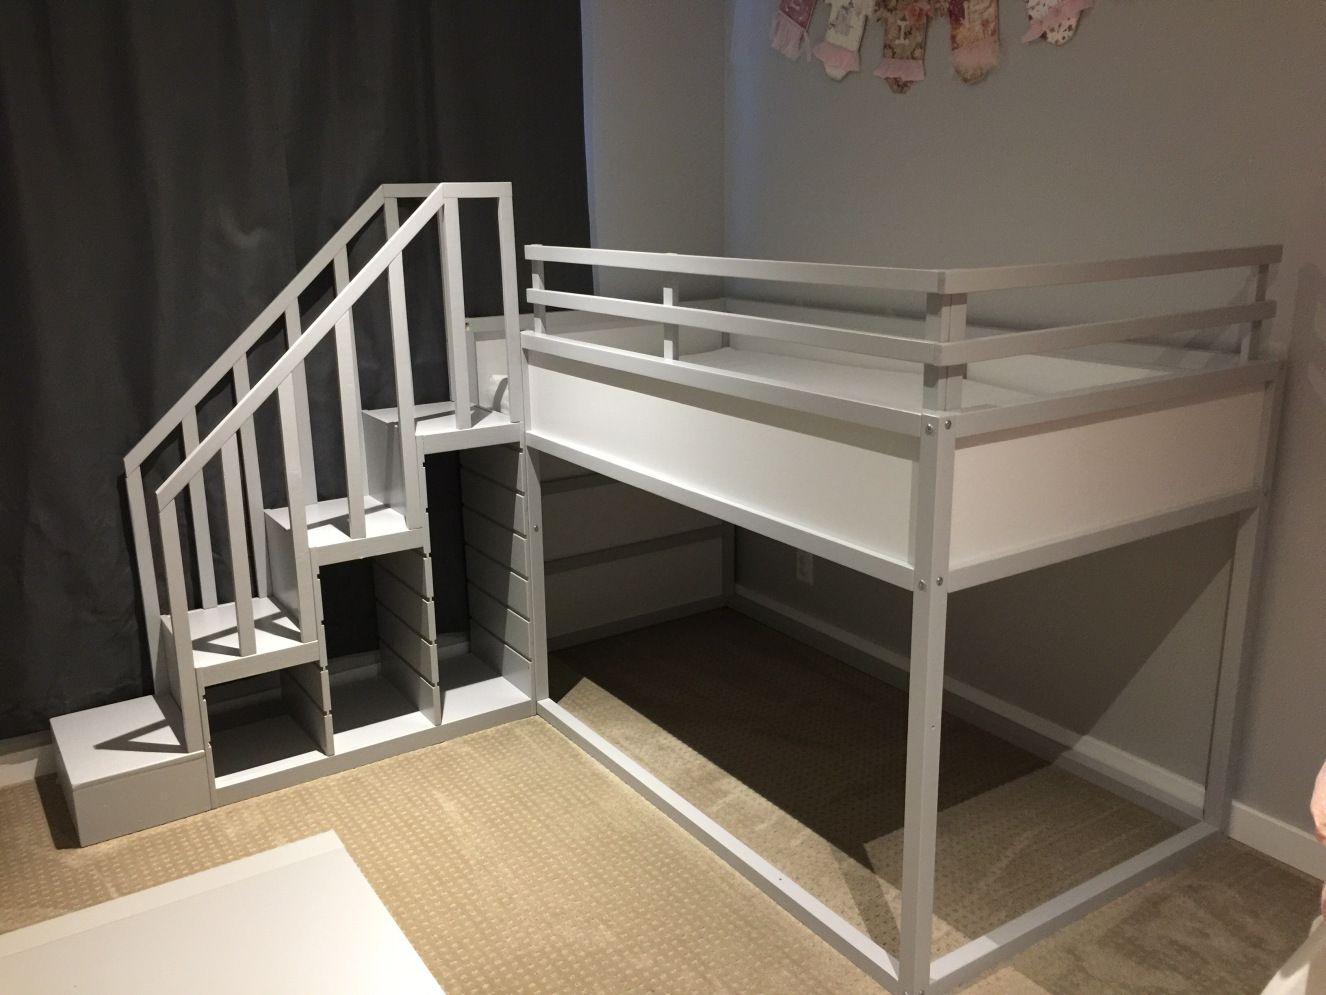 Kura loft bed ideas  IKEA Kura Bunk Bed Hack  Safety Room and Kids rooms